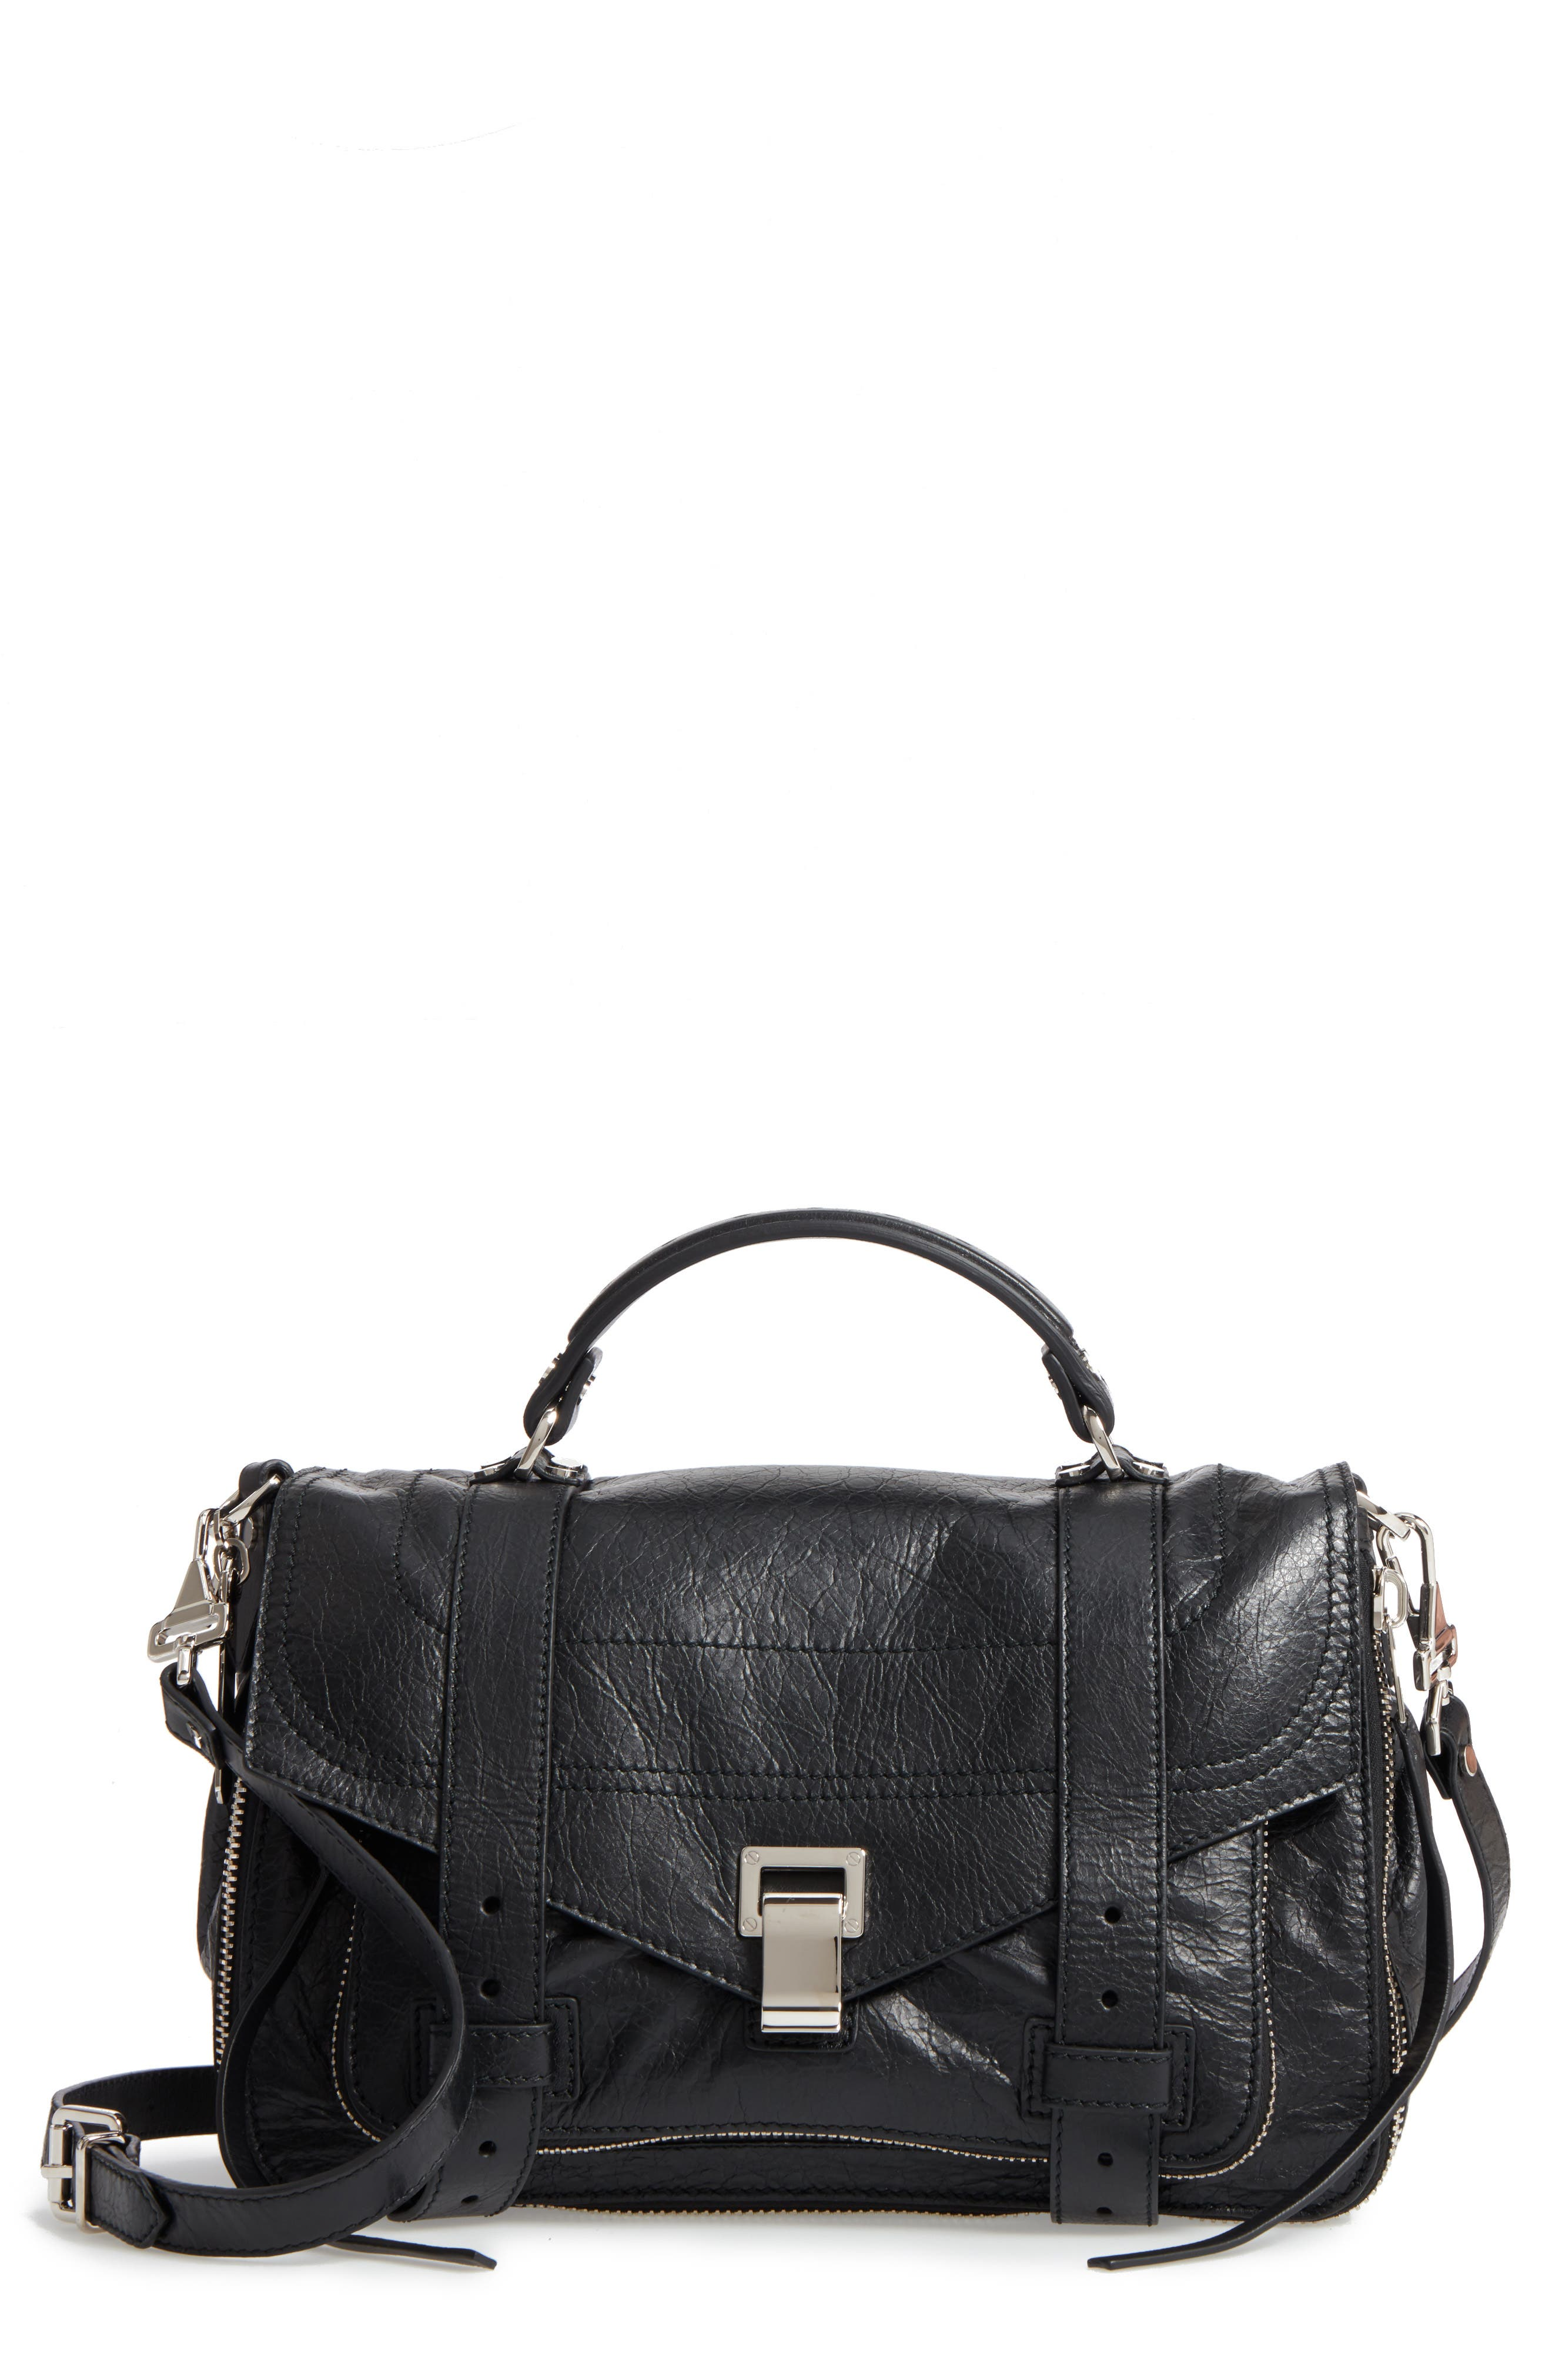 Medium PS1 Paper Leather Satchel,                         Main,                         color, BLACK